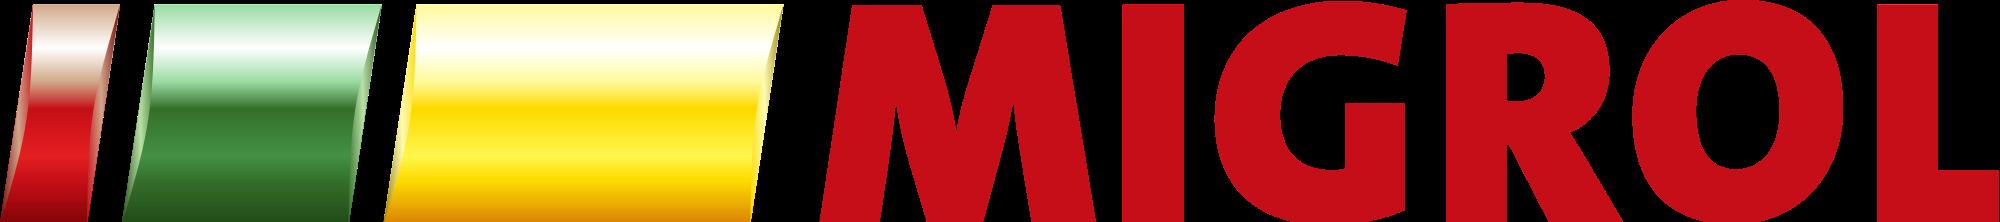 Migrol_logo.png